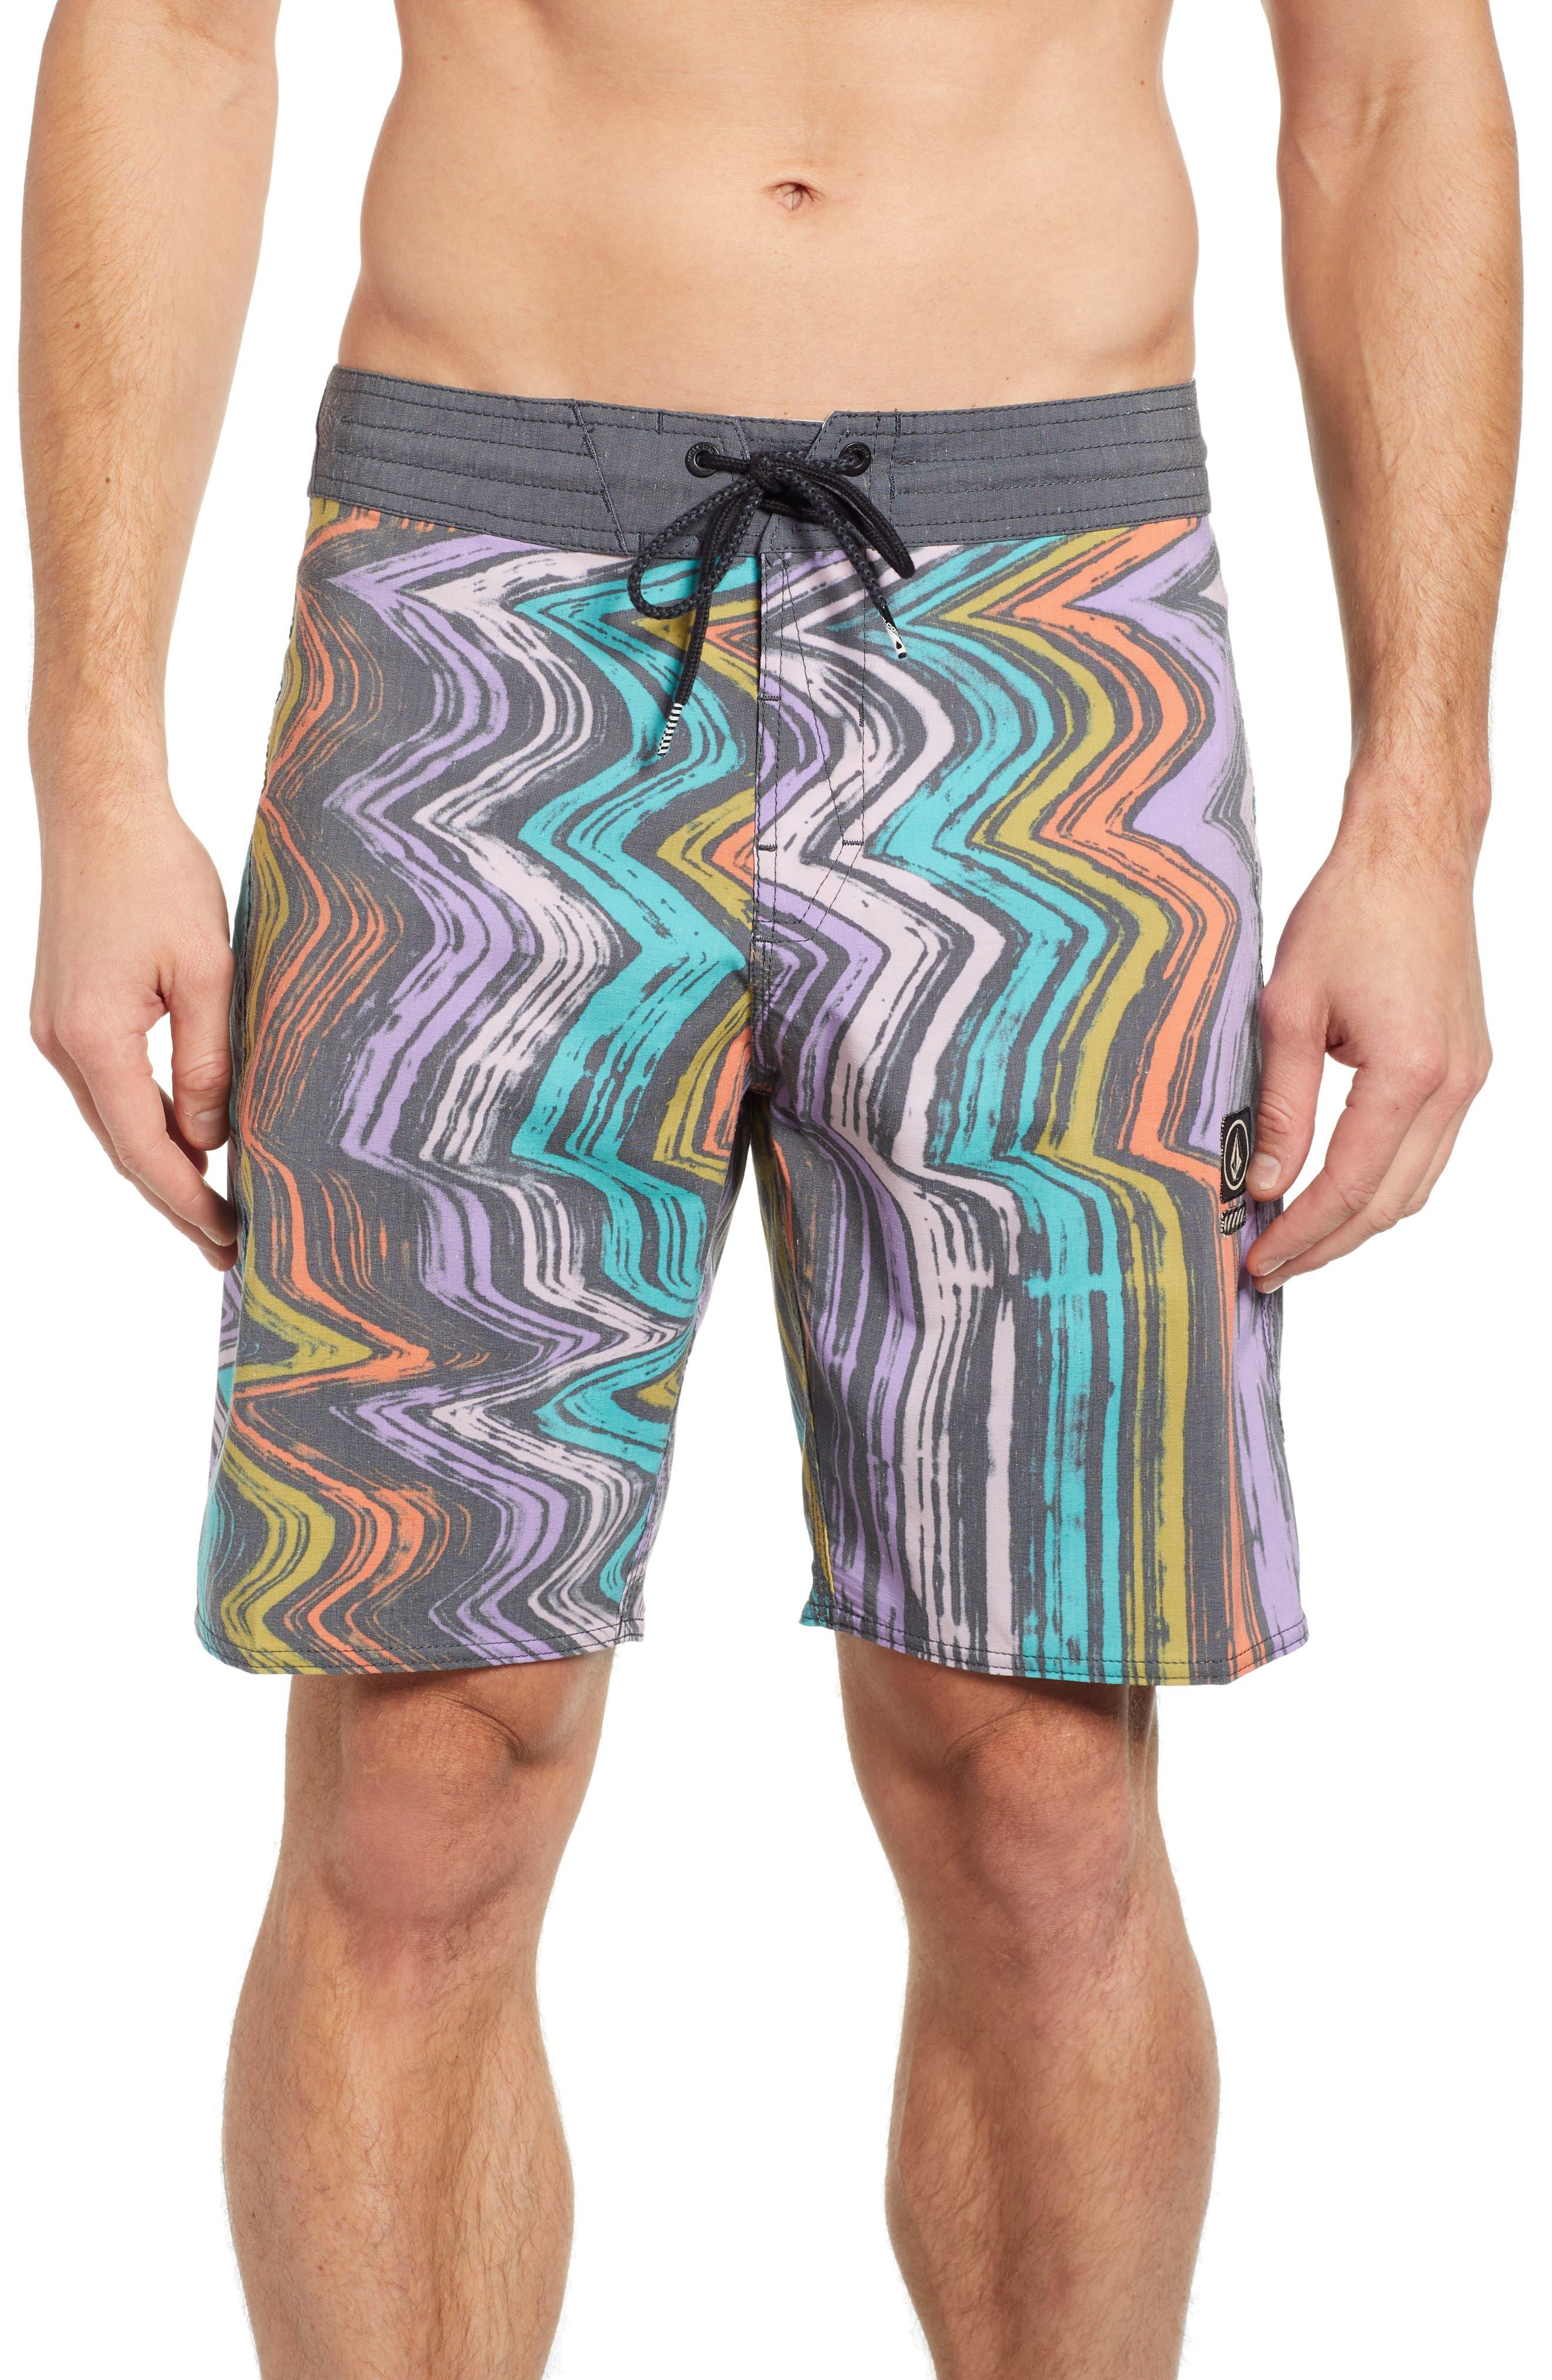 Lo-Fi Stoney Board Shorts,                             Main thumbnail 1, color,                             ASPHALT BLACK